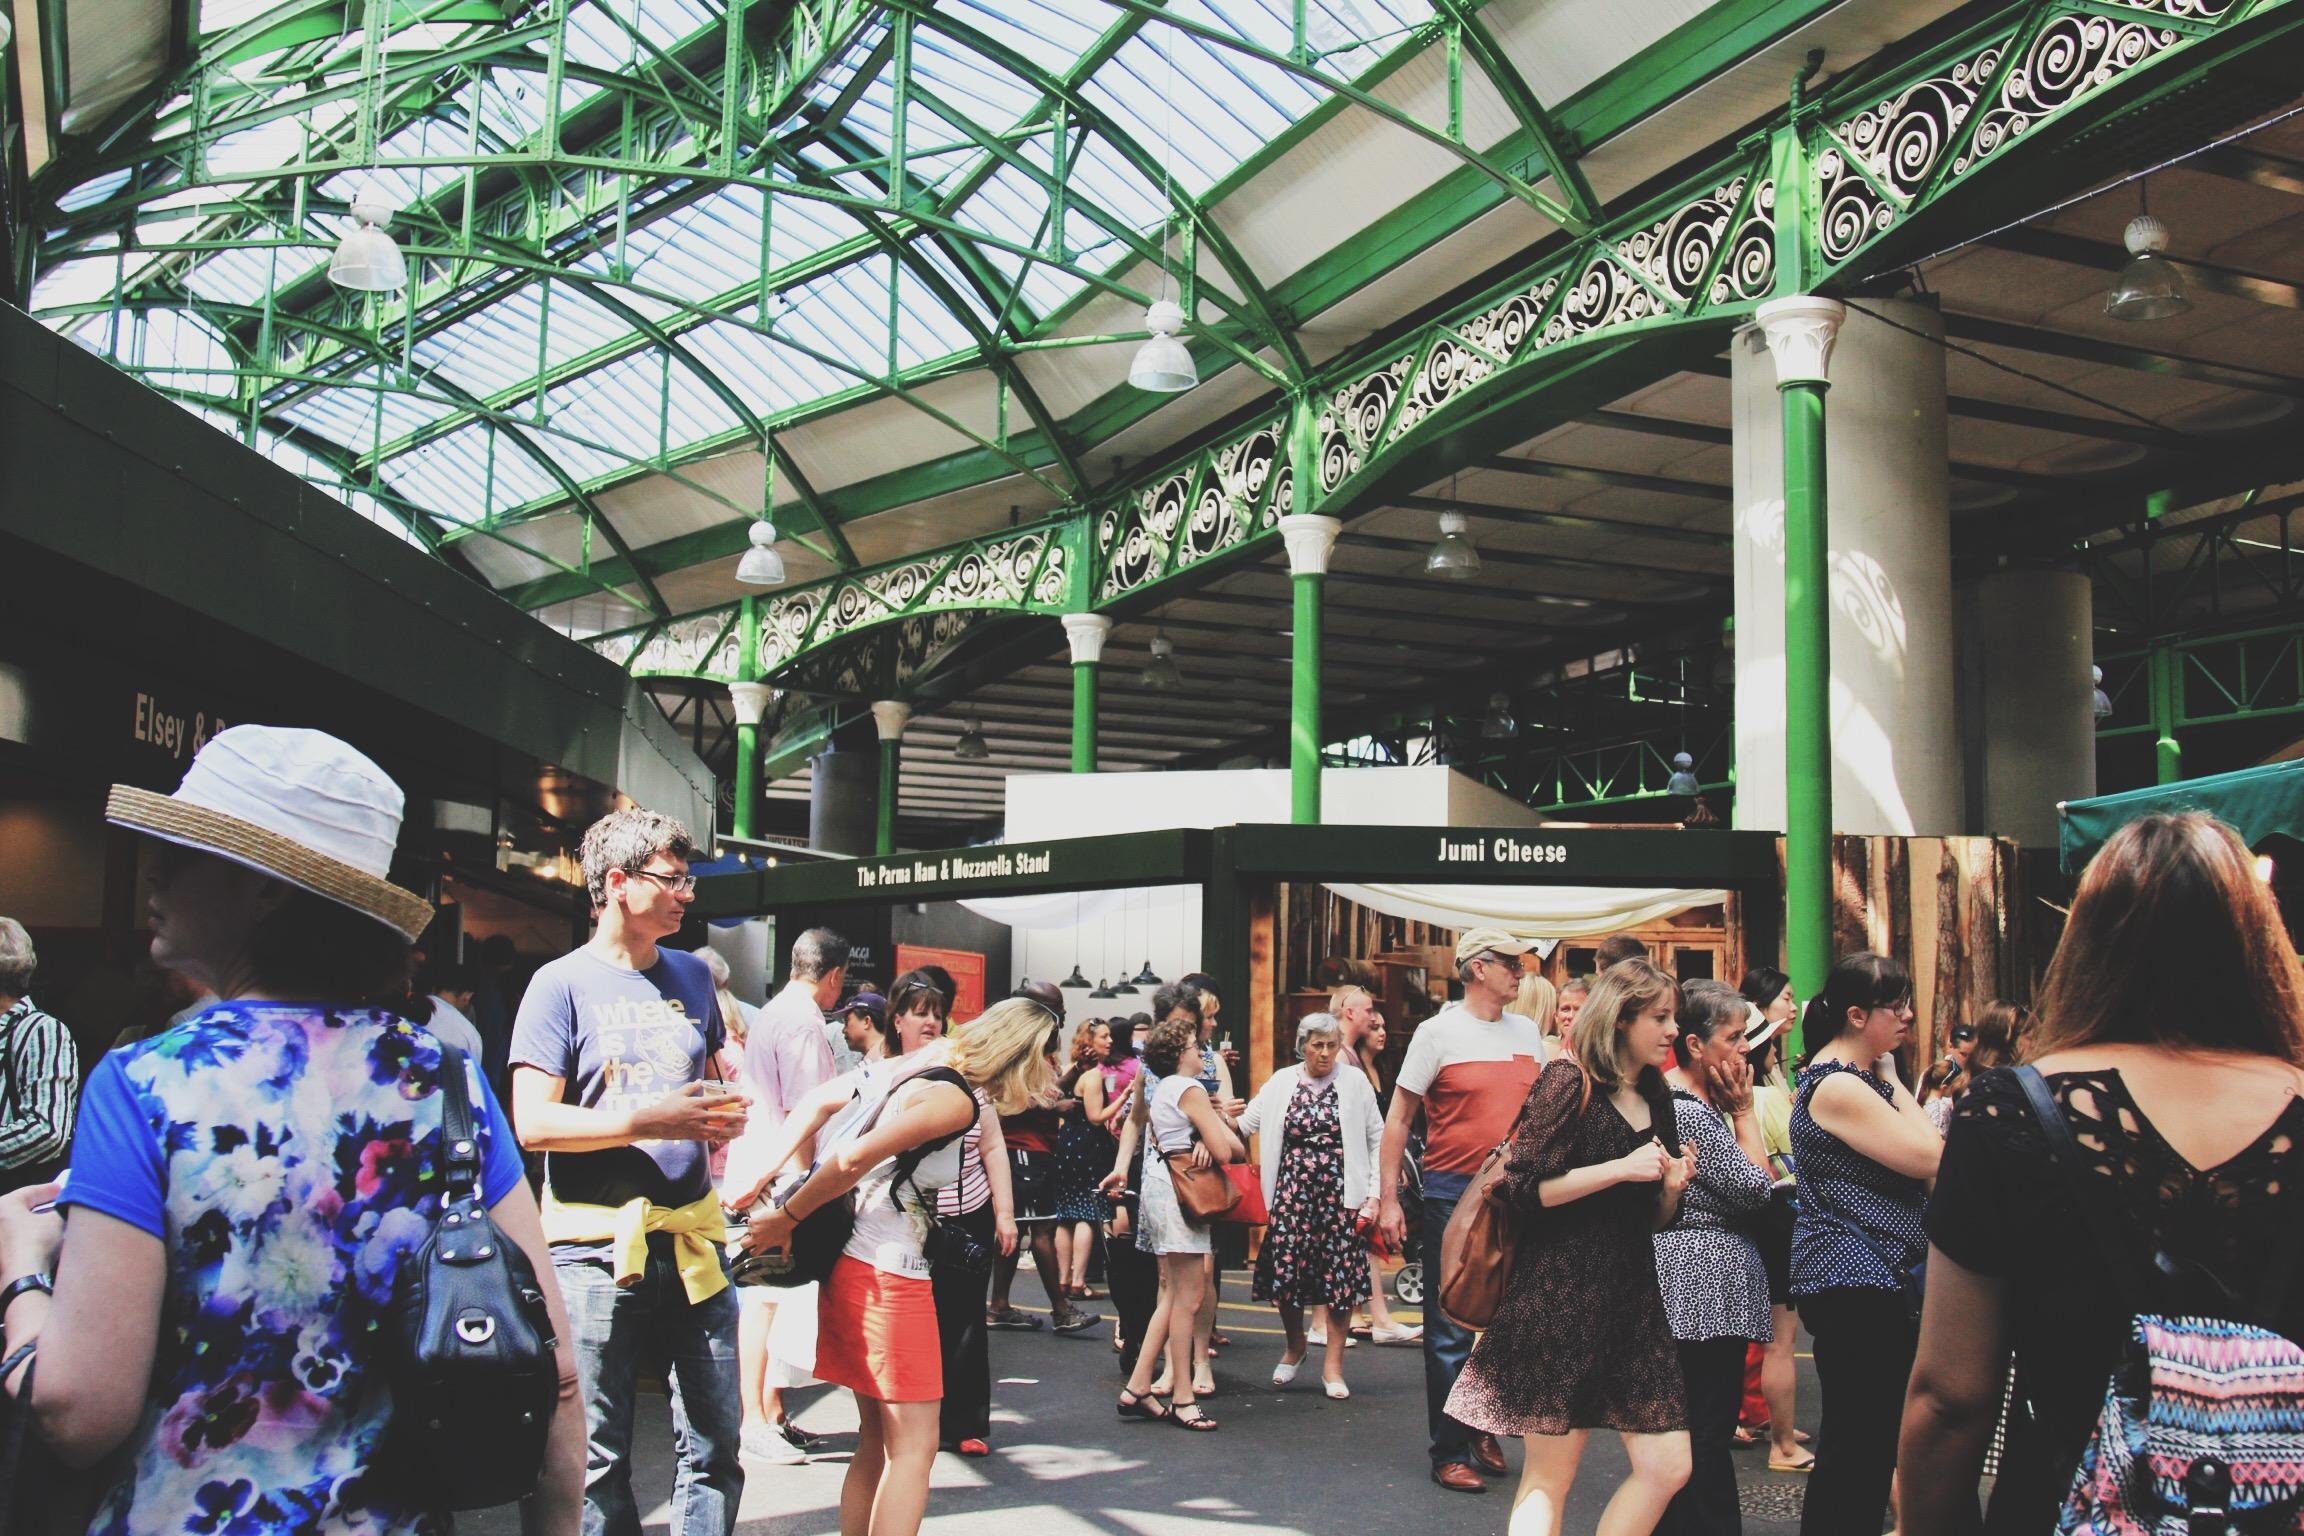 Borough-market-londres-blog-onmyway.jpg